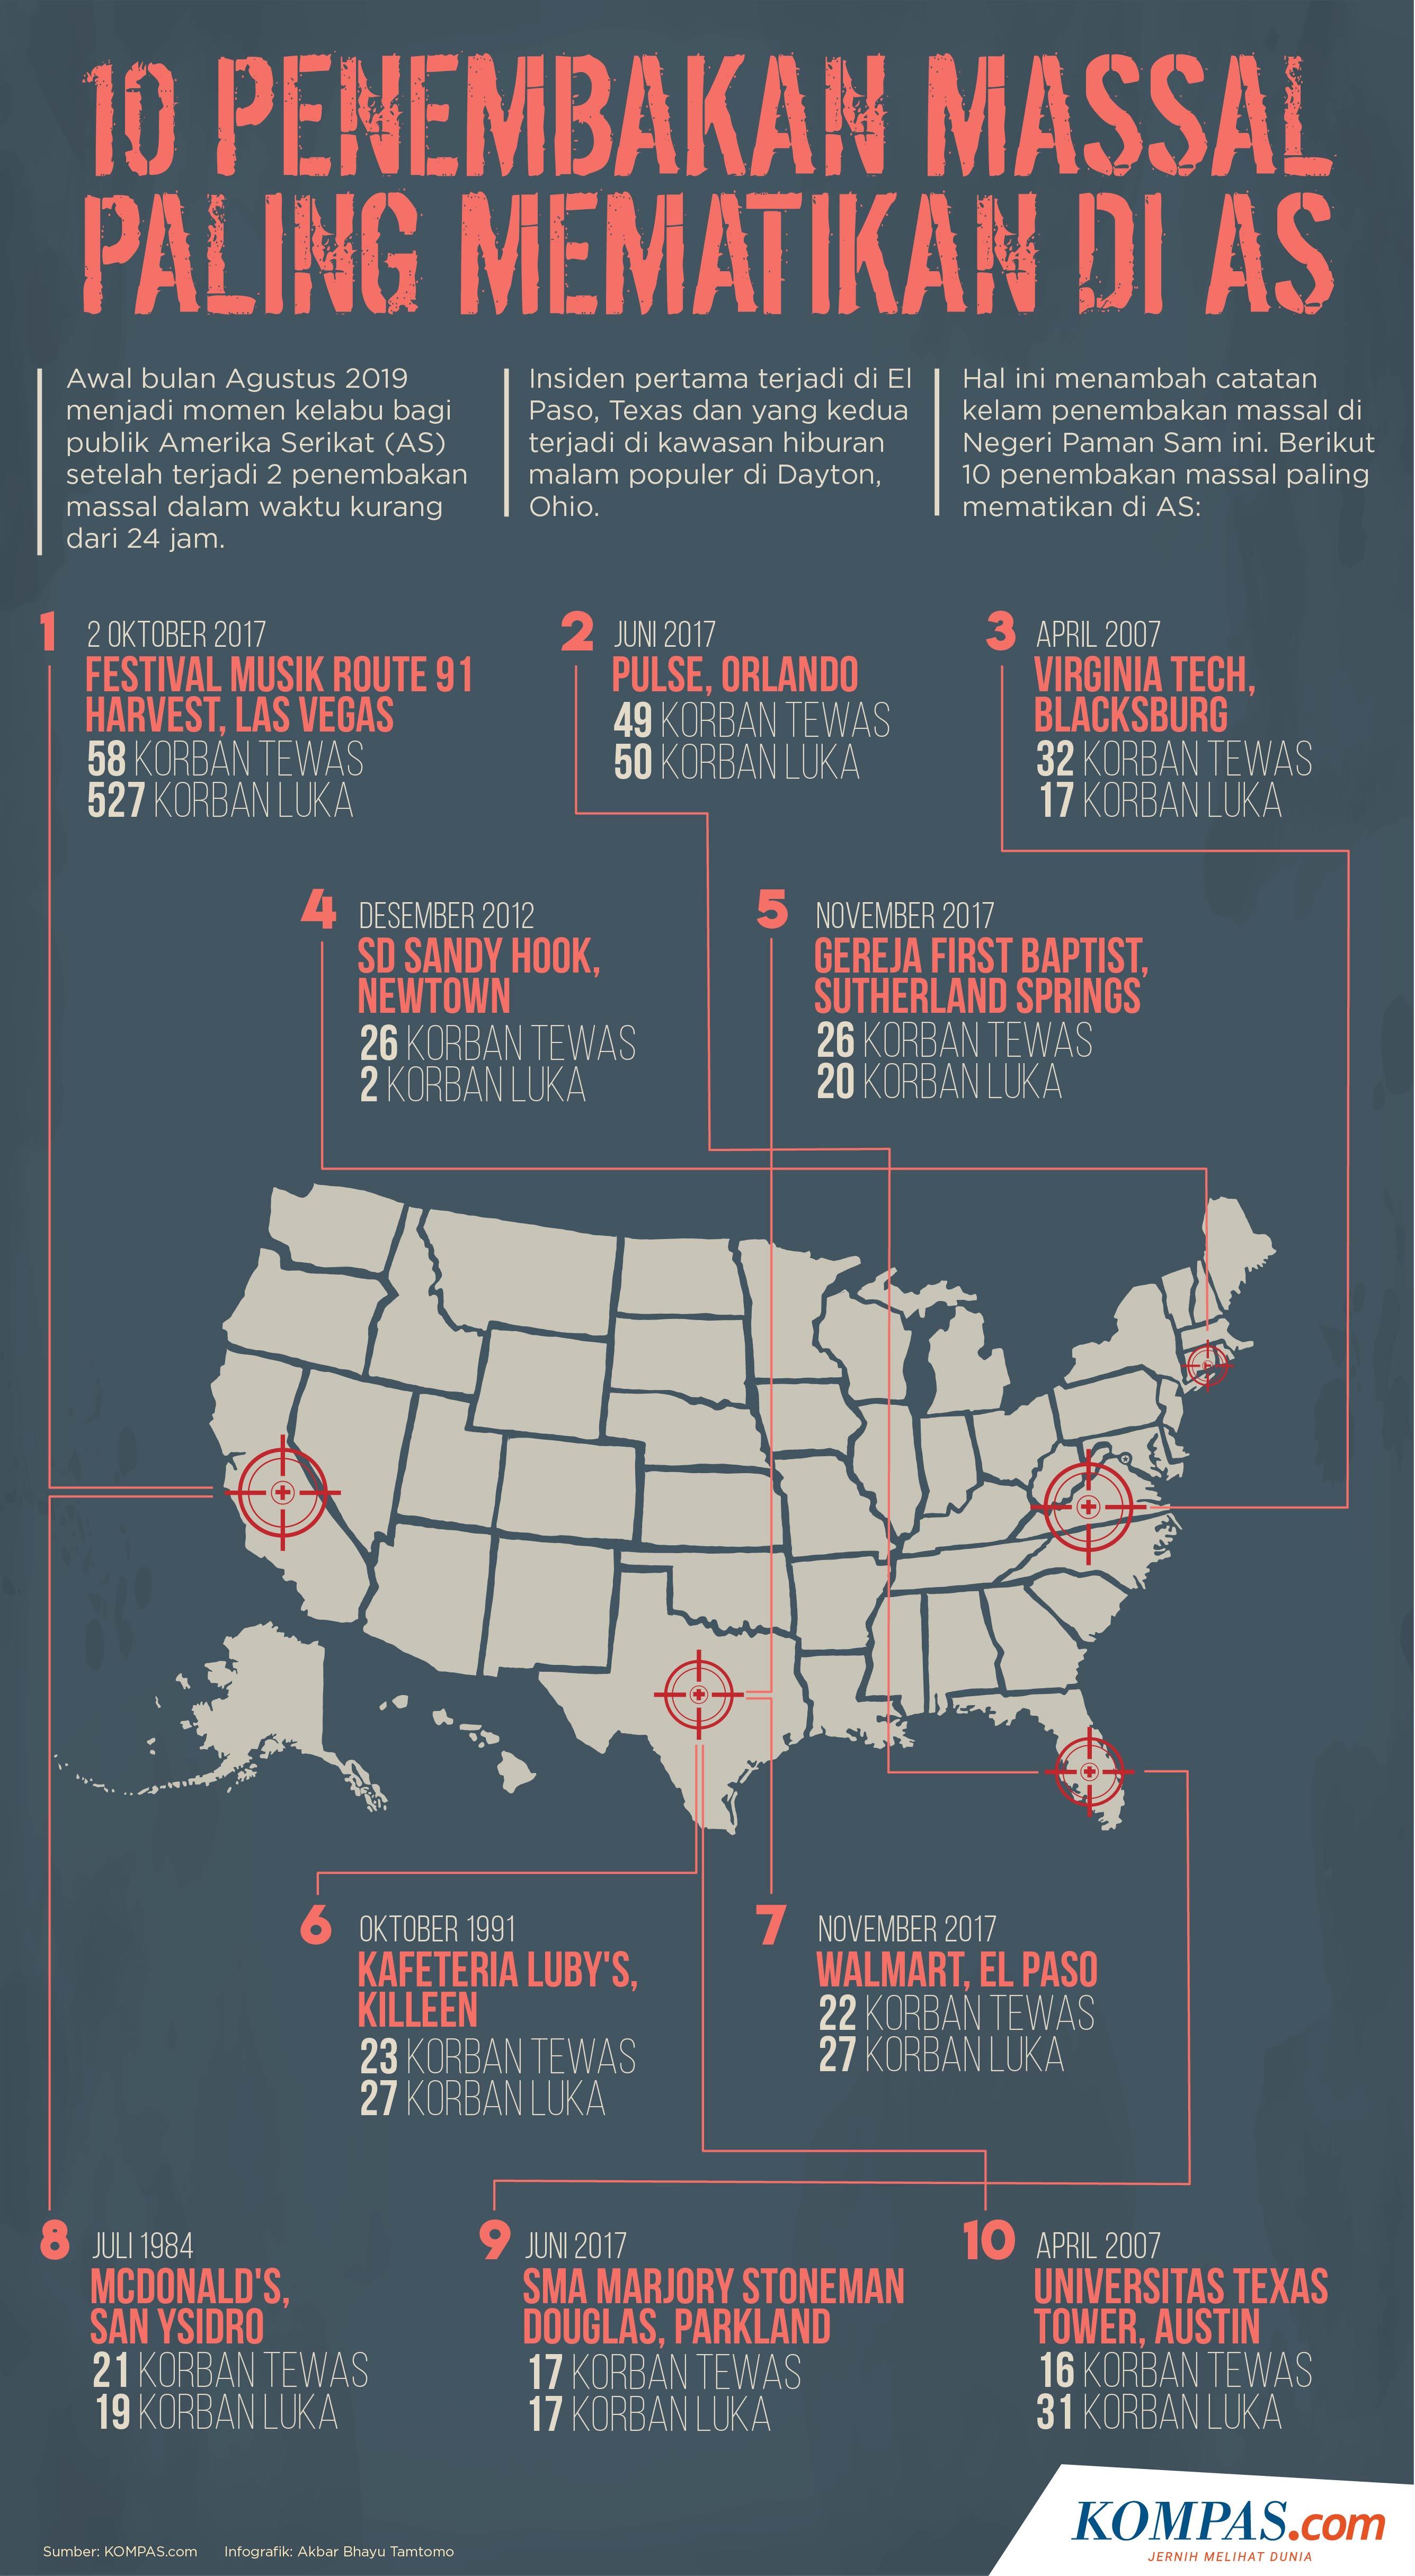 Kisah Kisah Pengorbanan Yang Terjadi Di Penembakan Massal Texas